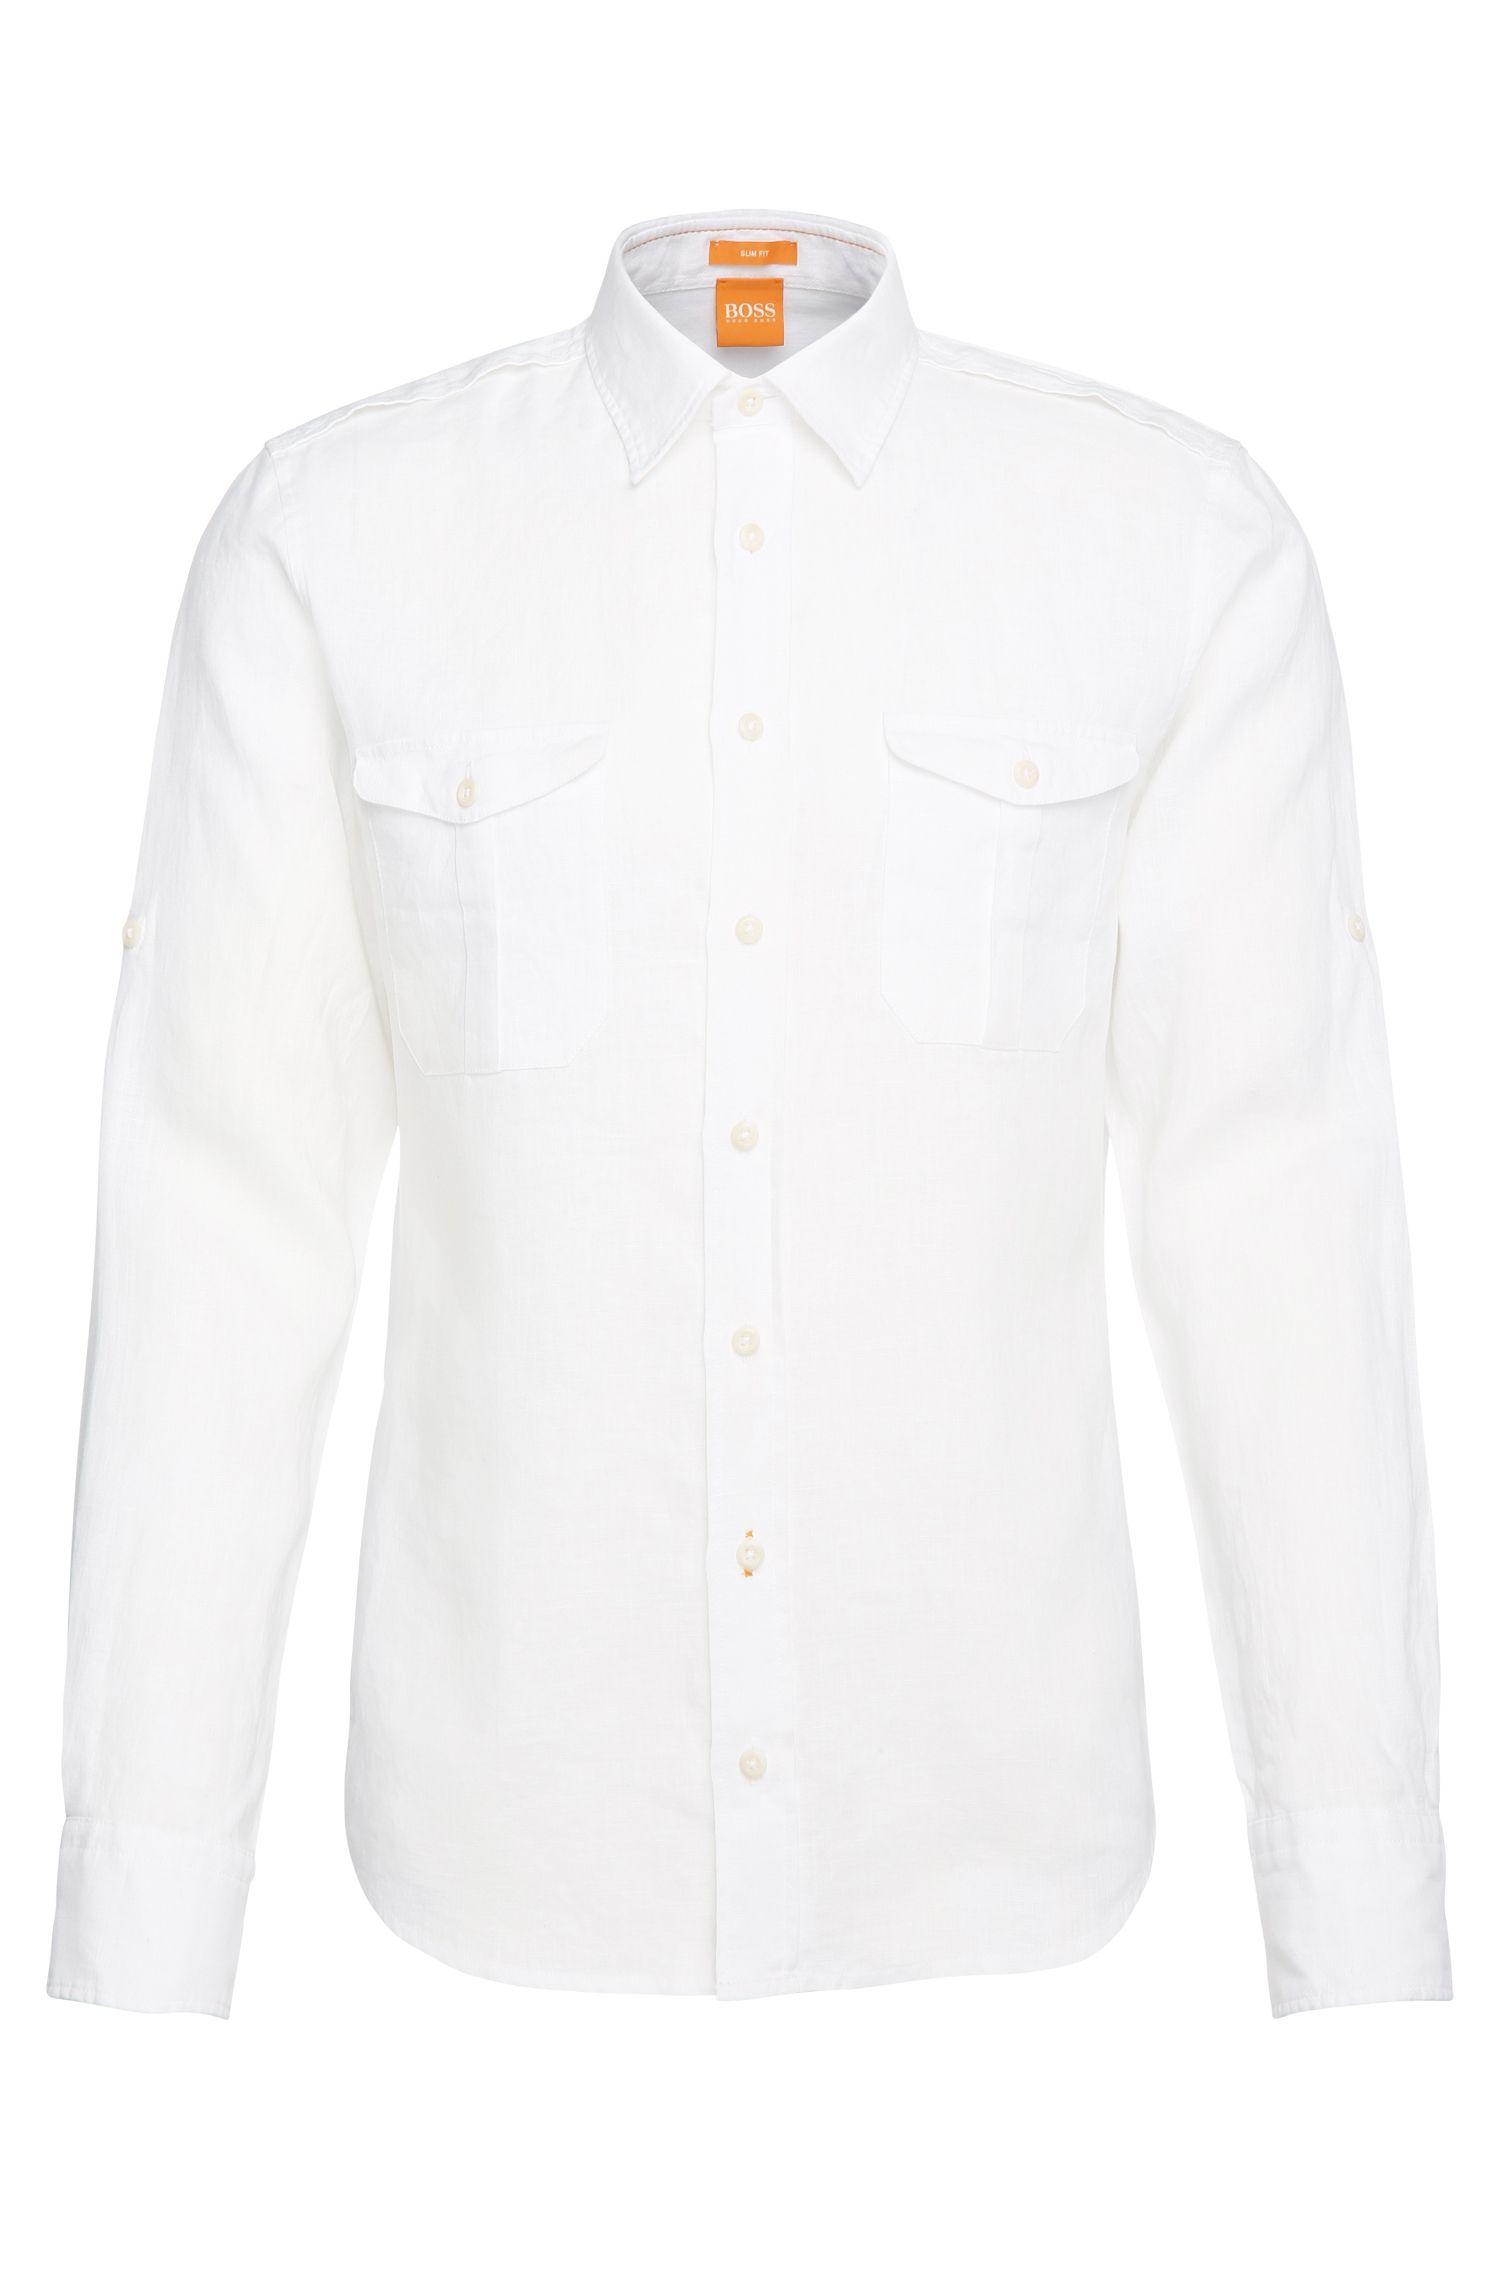 Cotton Button Down Shirt, Slim Fit | Cadetto